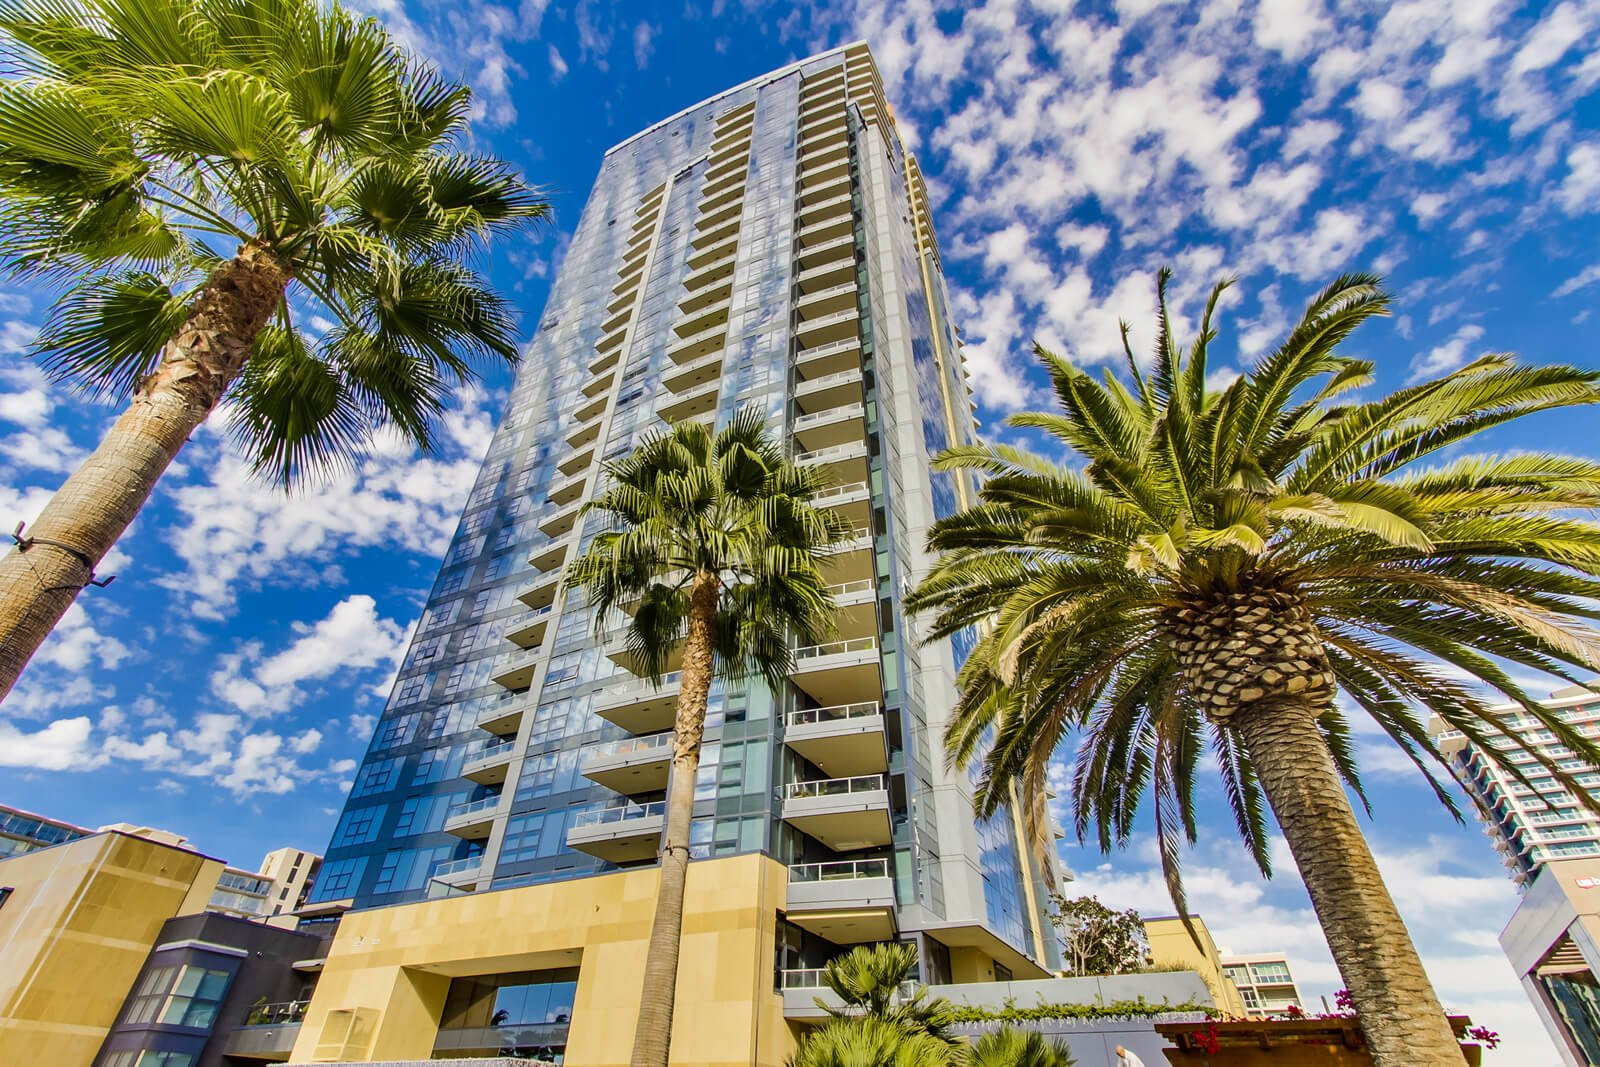 Bayside, Columbia District, San Diego